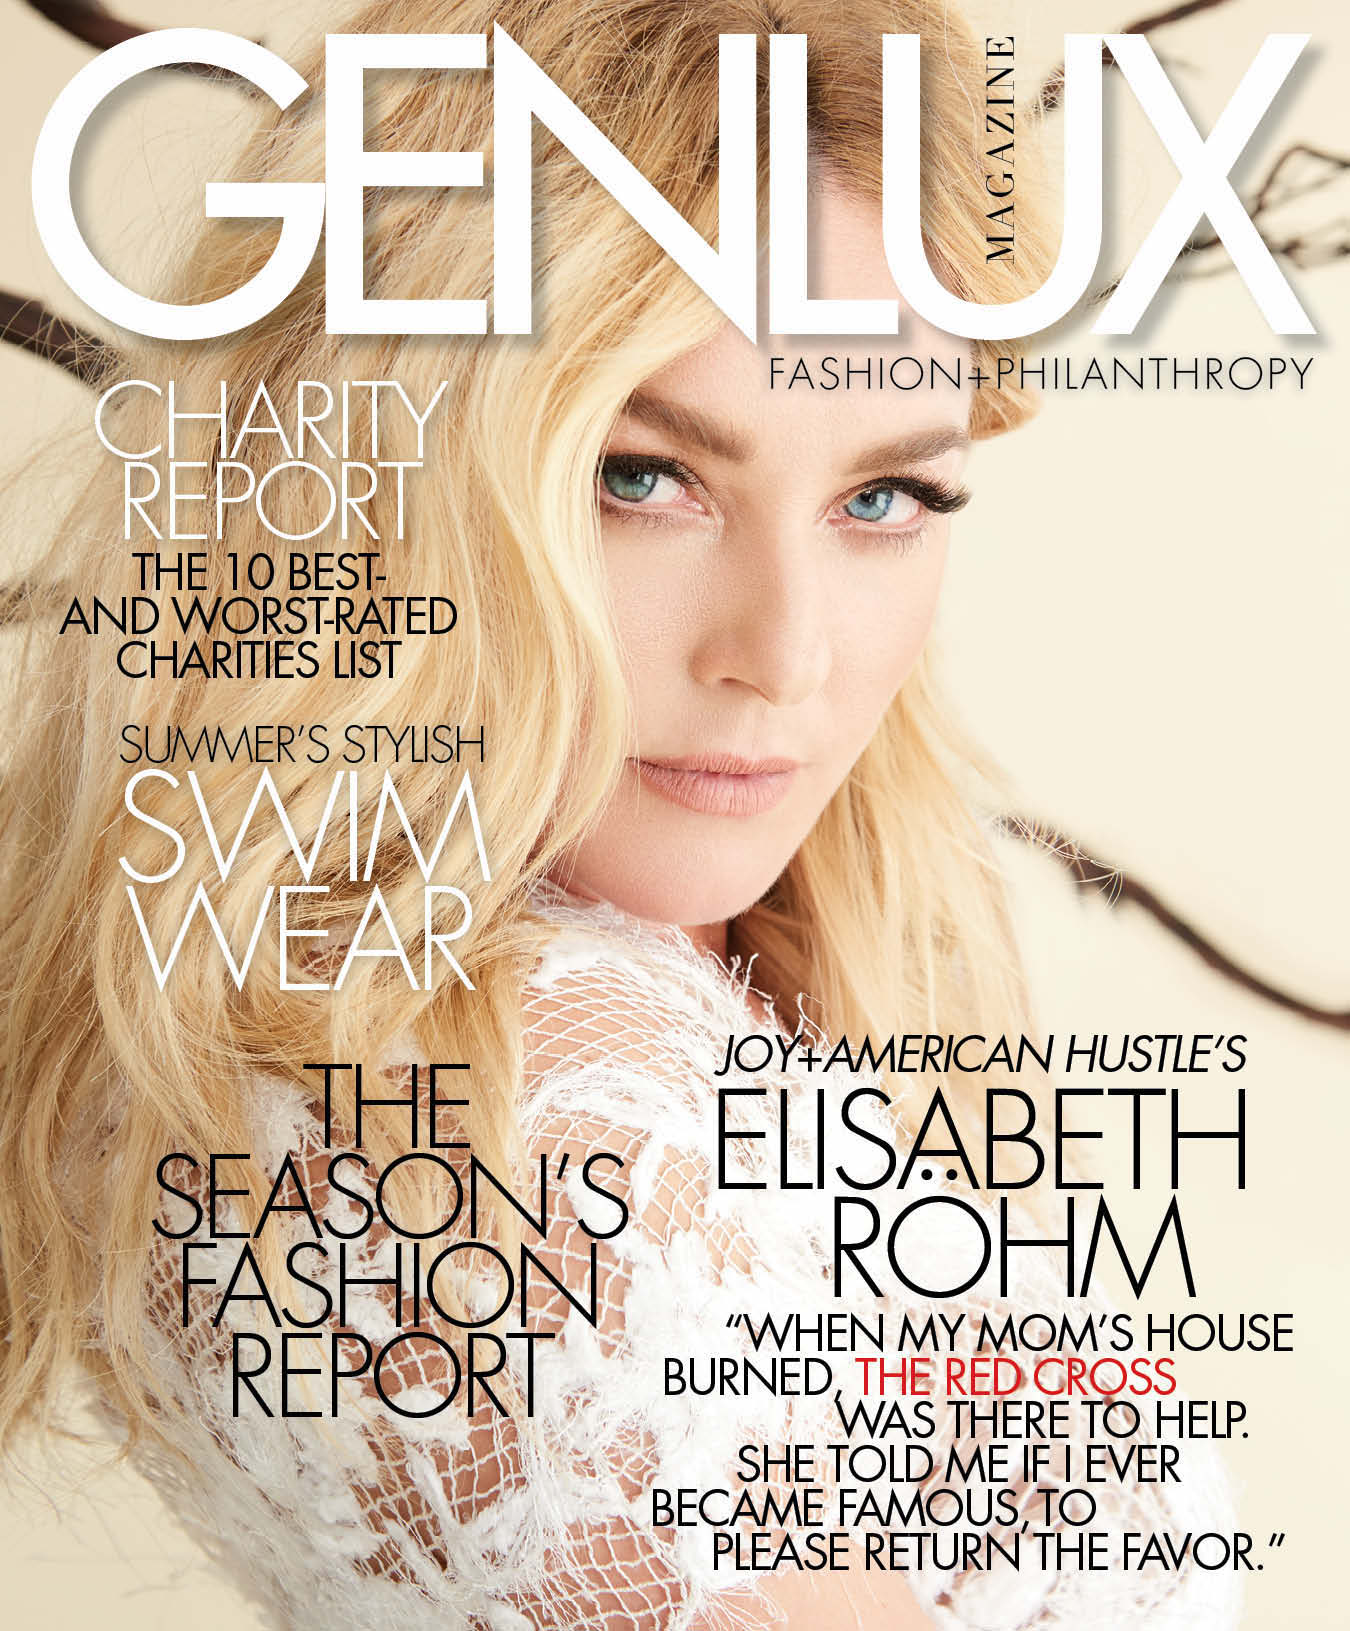 GENLUX_COVER_ROHM_6.jpg